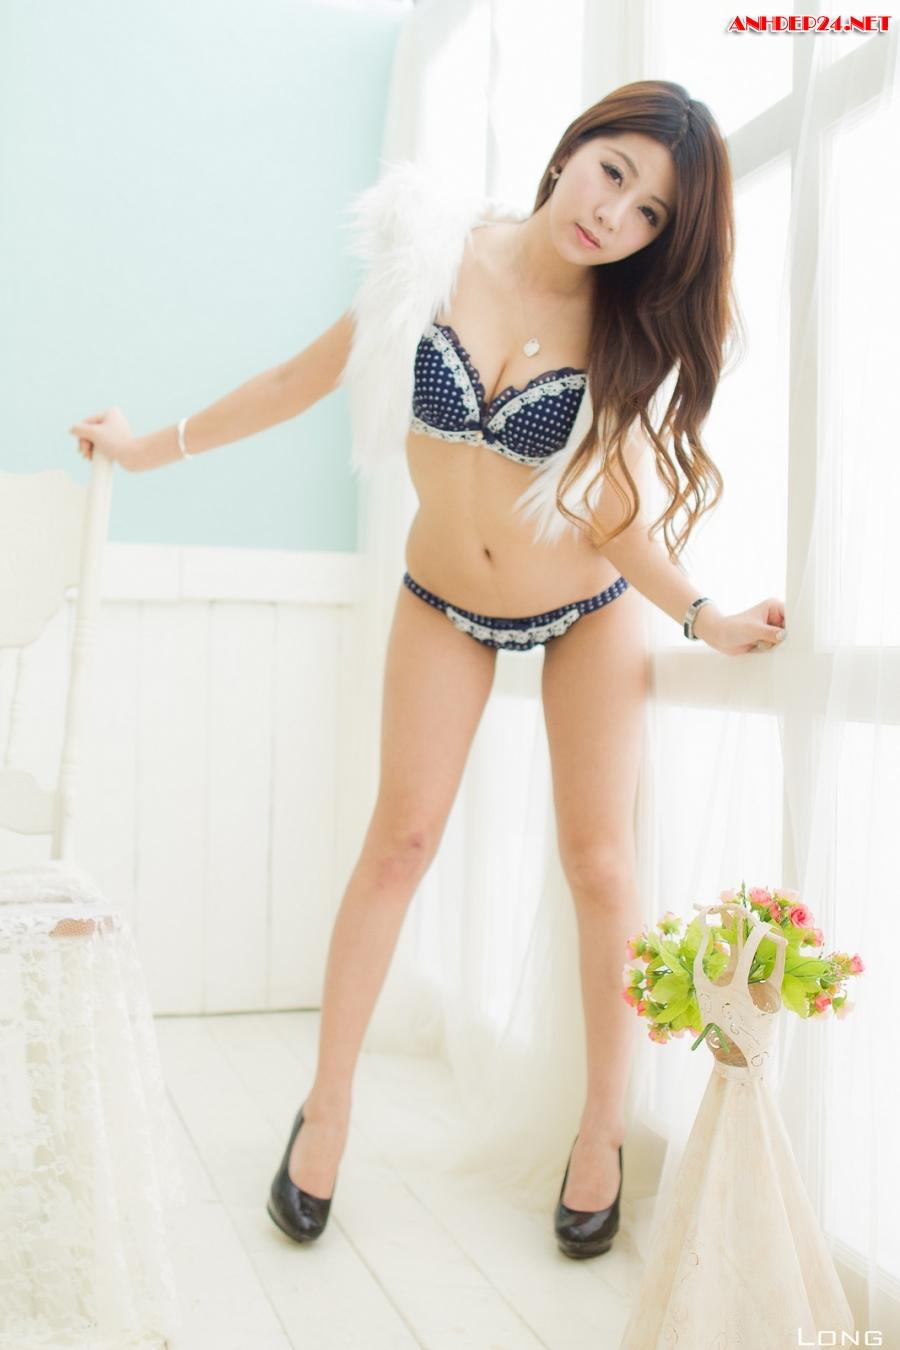 Giekao klaoruethai bikini